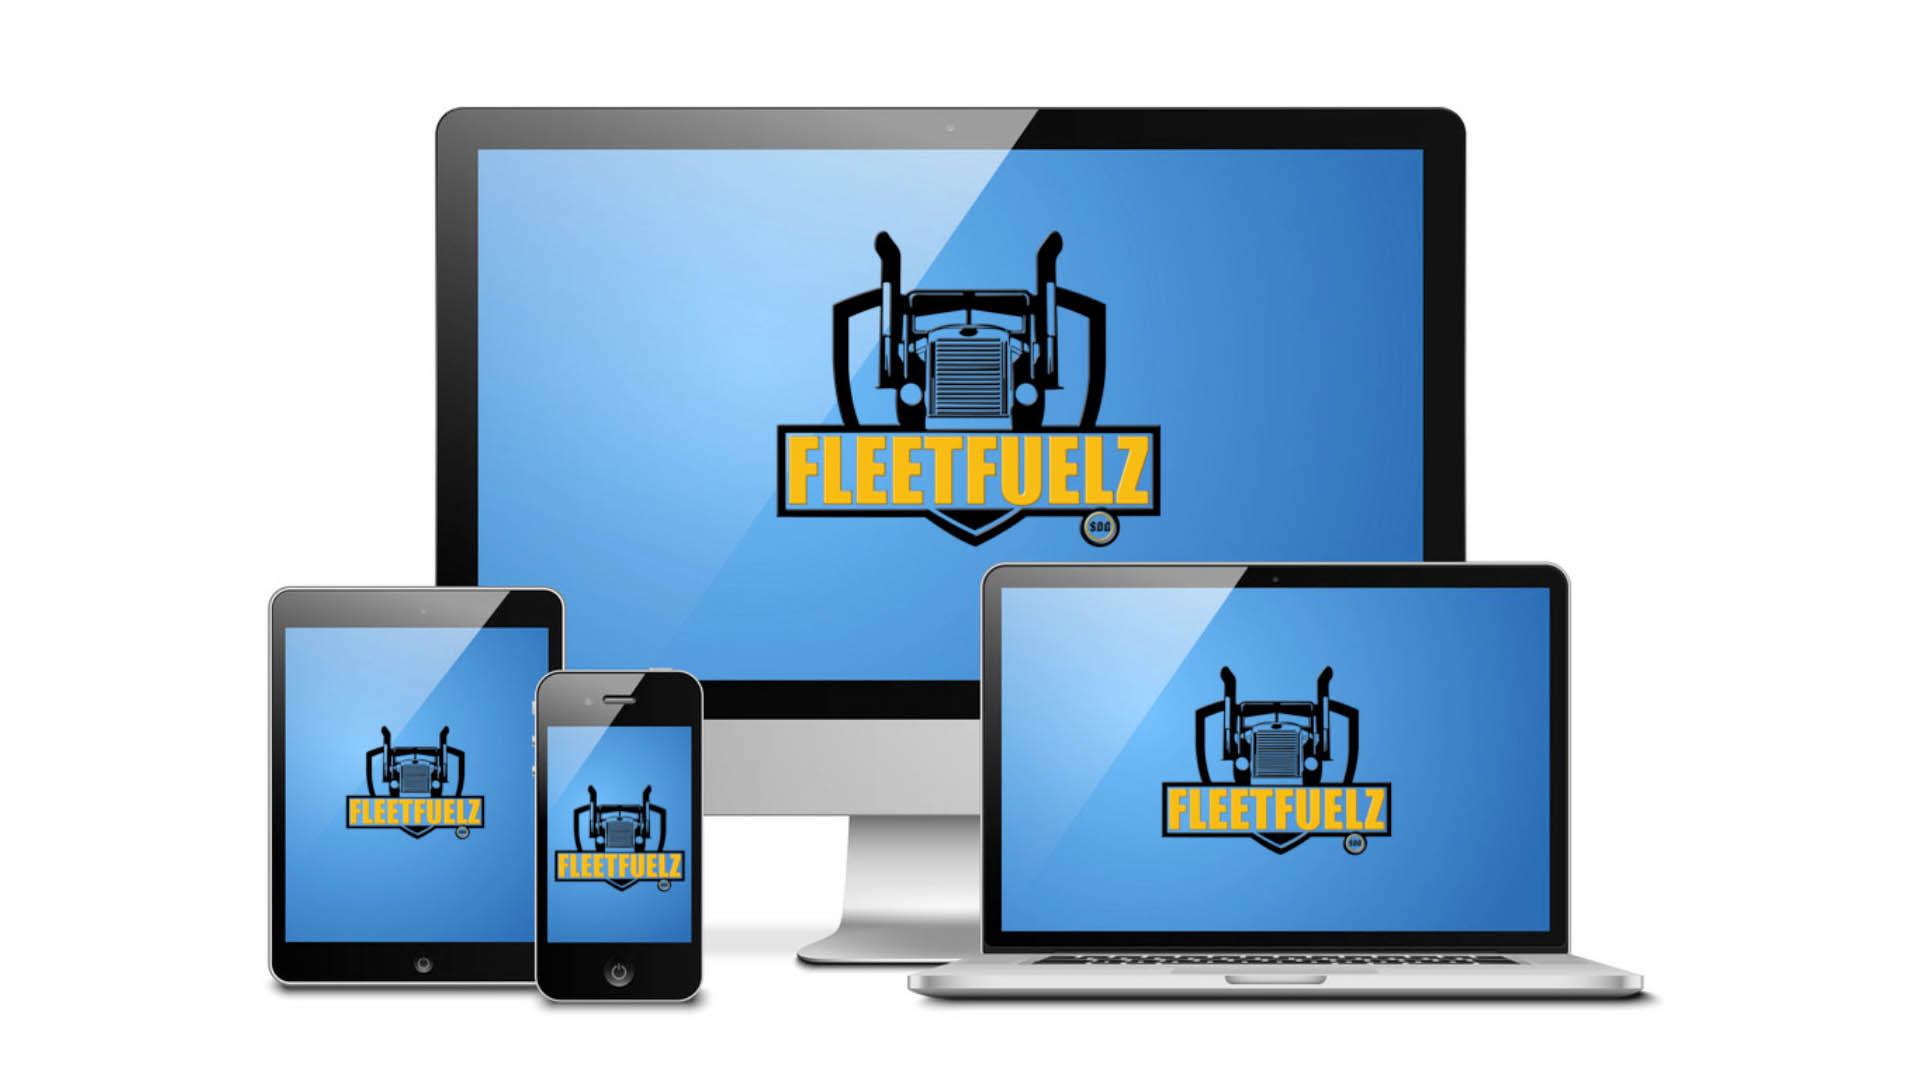 FleetFuelz Mobile Application (IOS & Android)